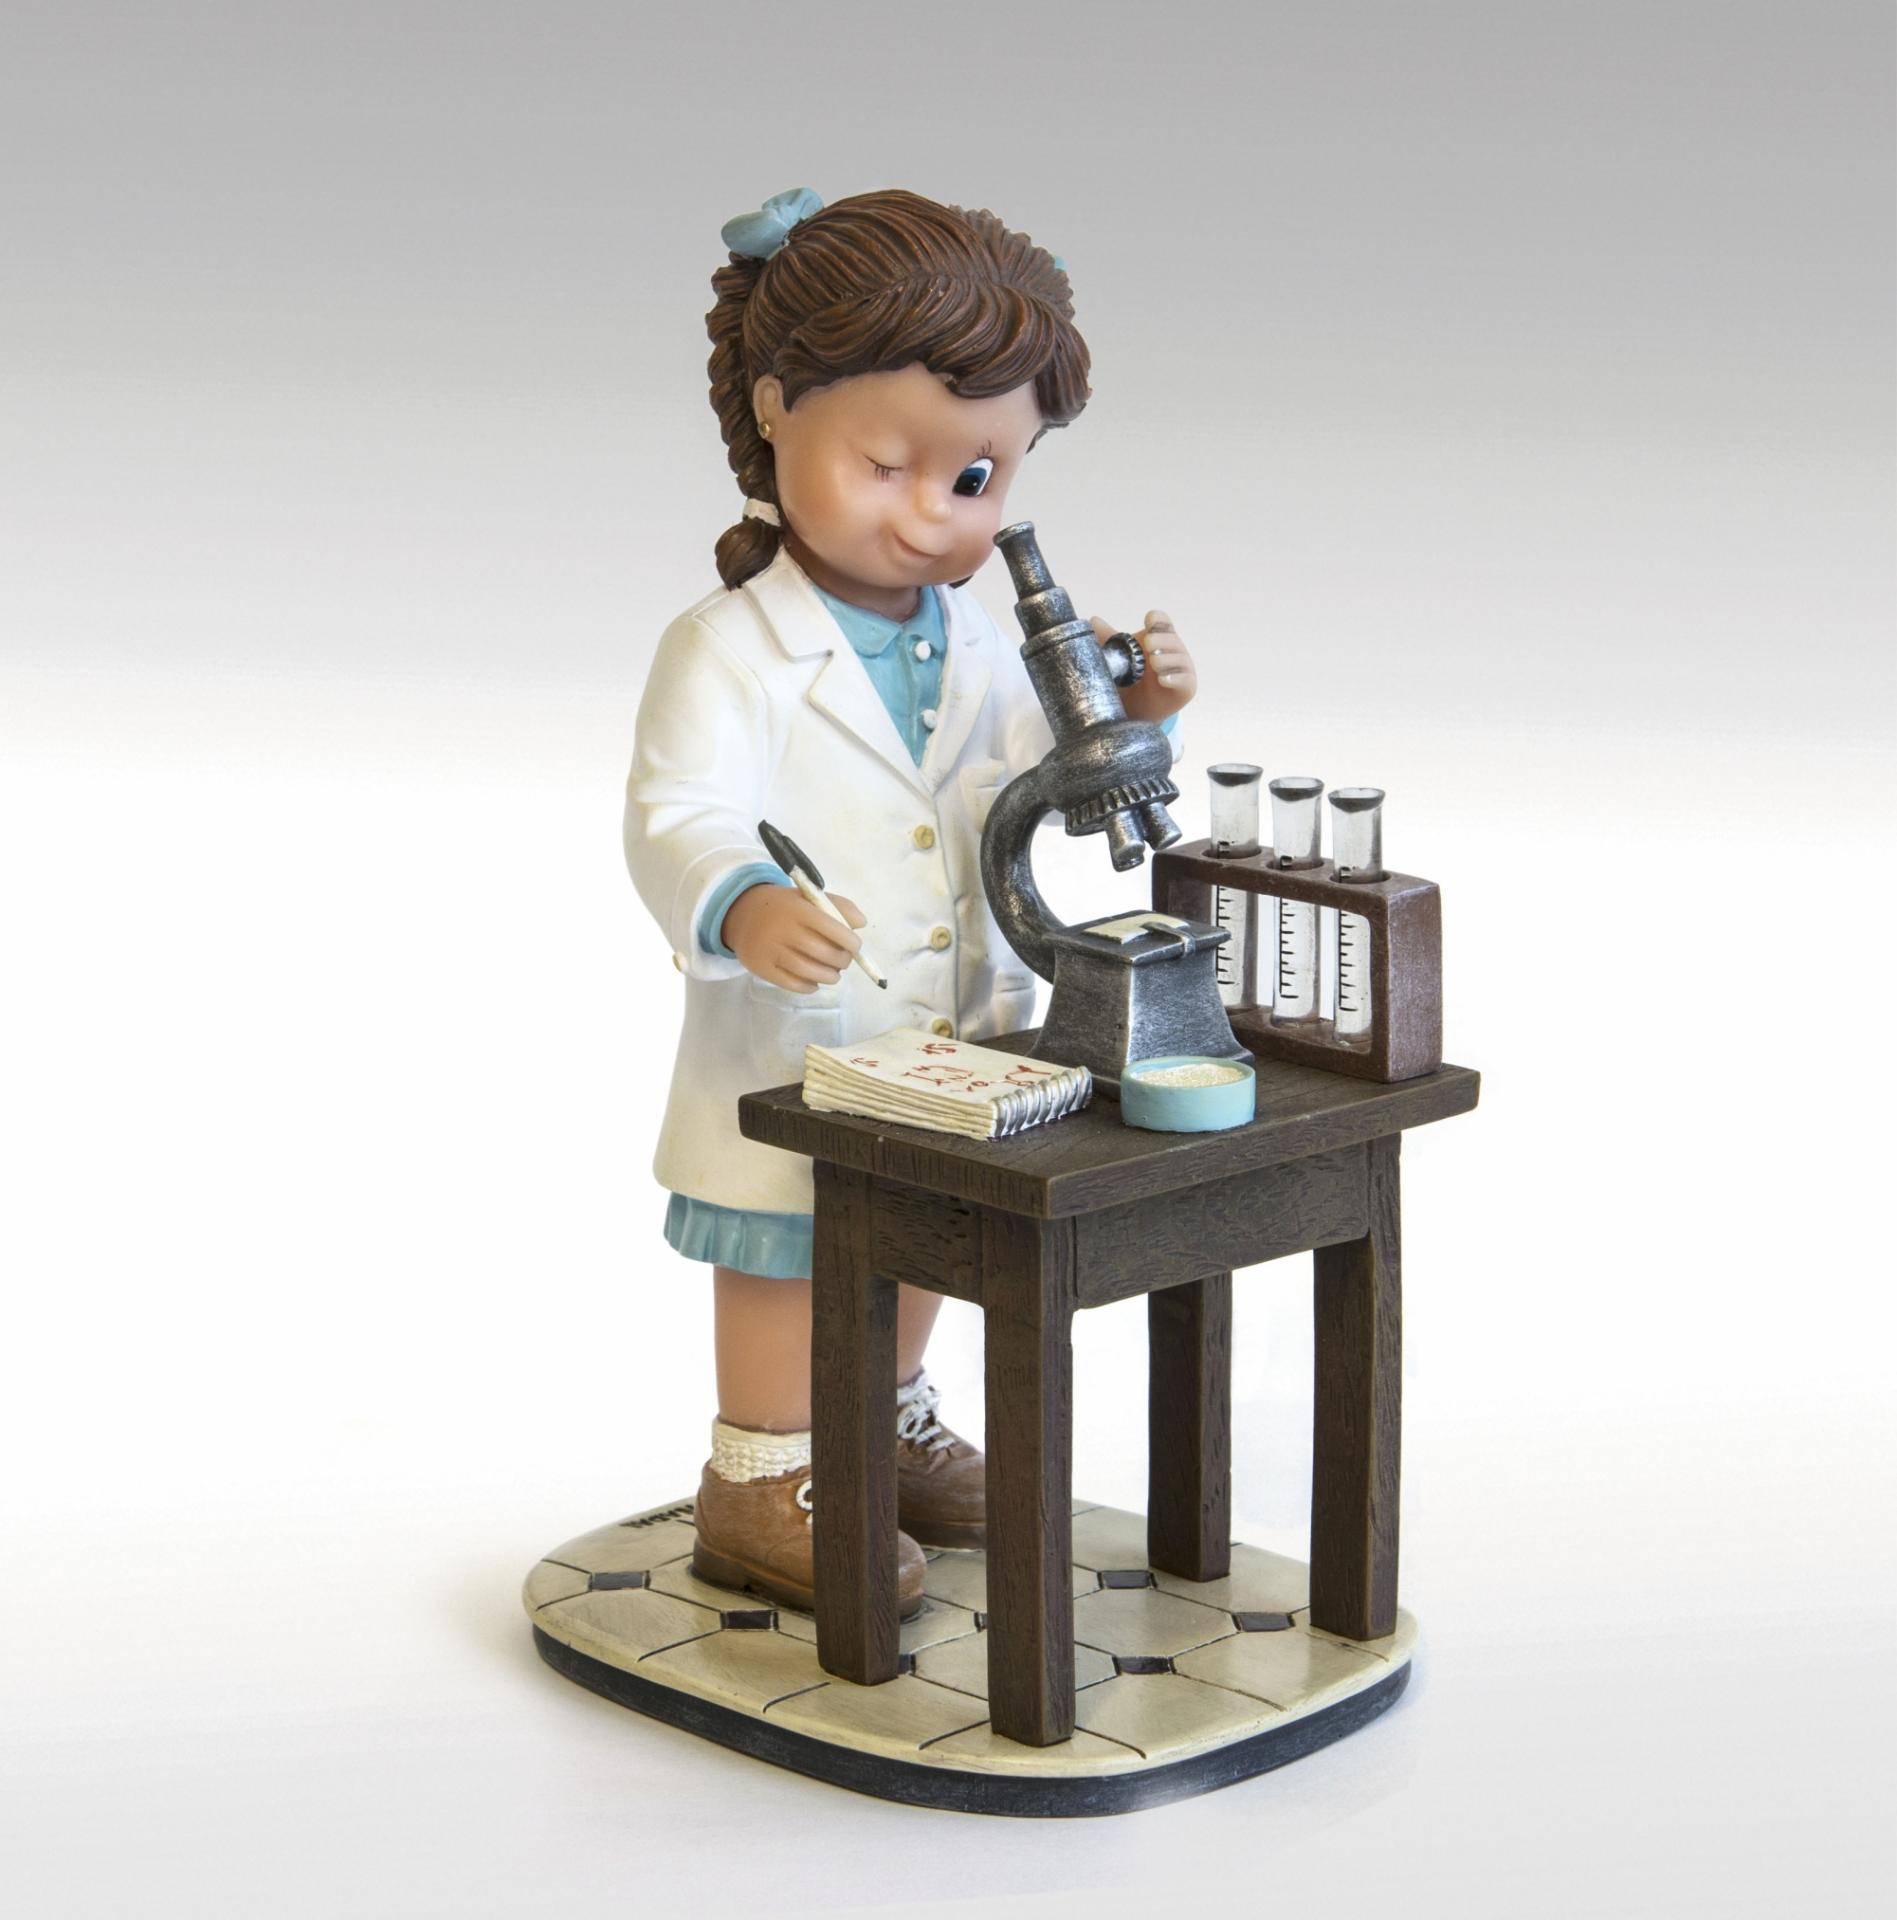 figura-mirando-a-traves-del-microscopio-746778-nadal-studio-pequeños-tesoros-lomejorsg.jpg